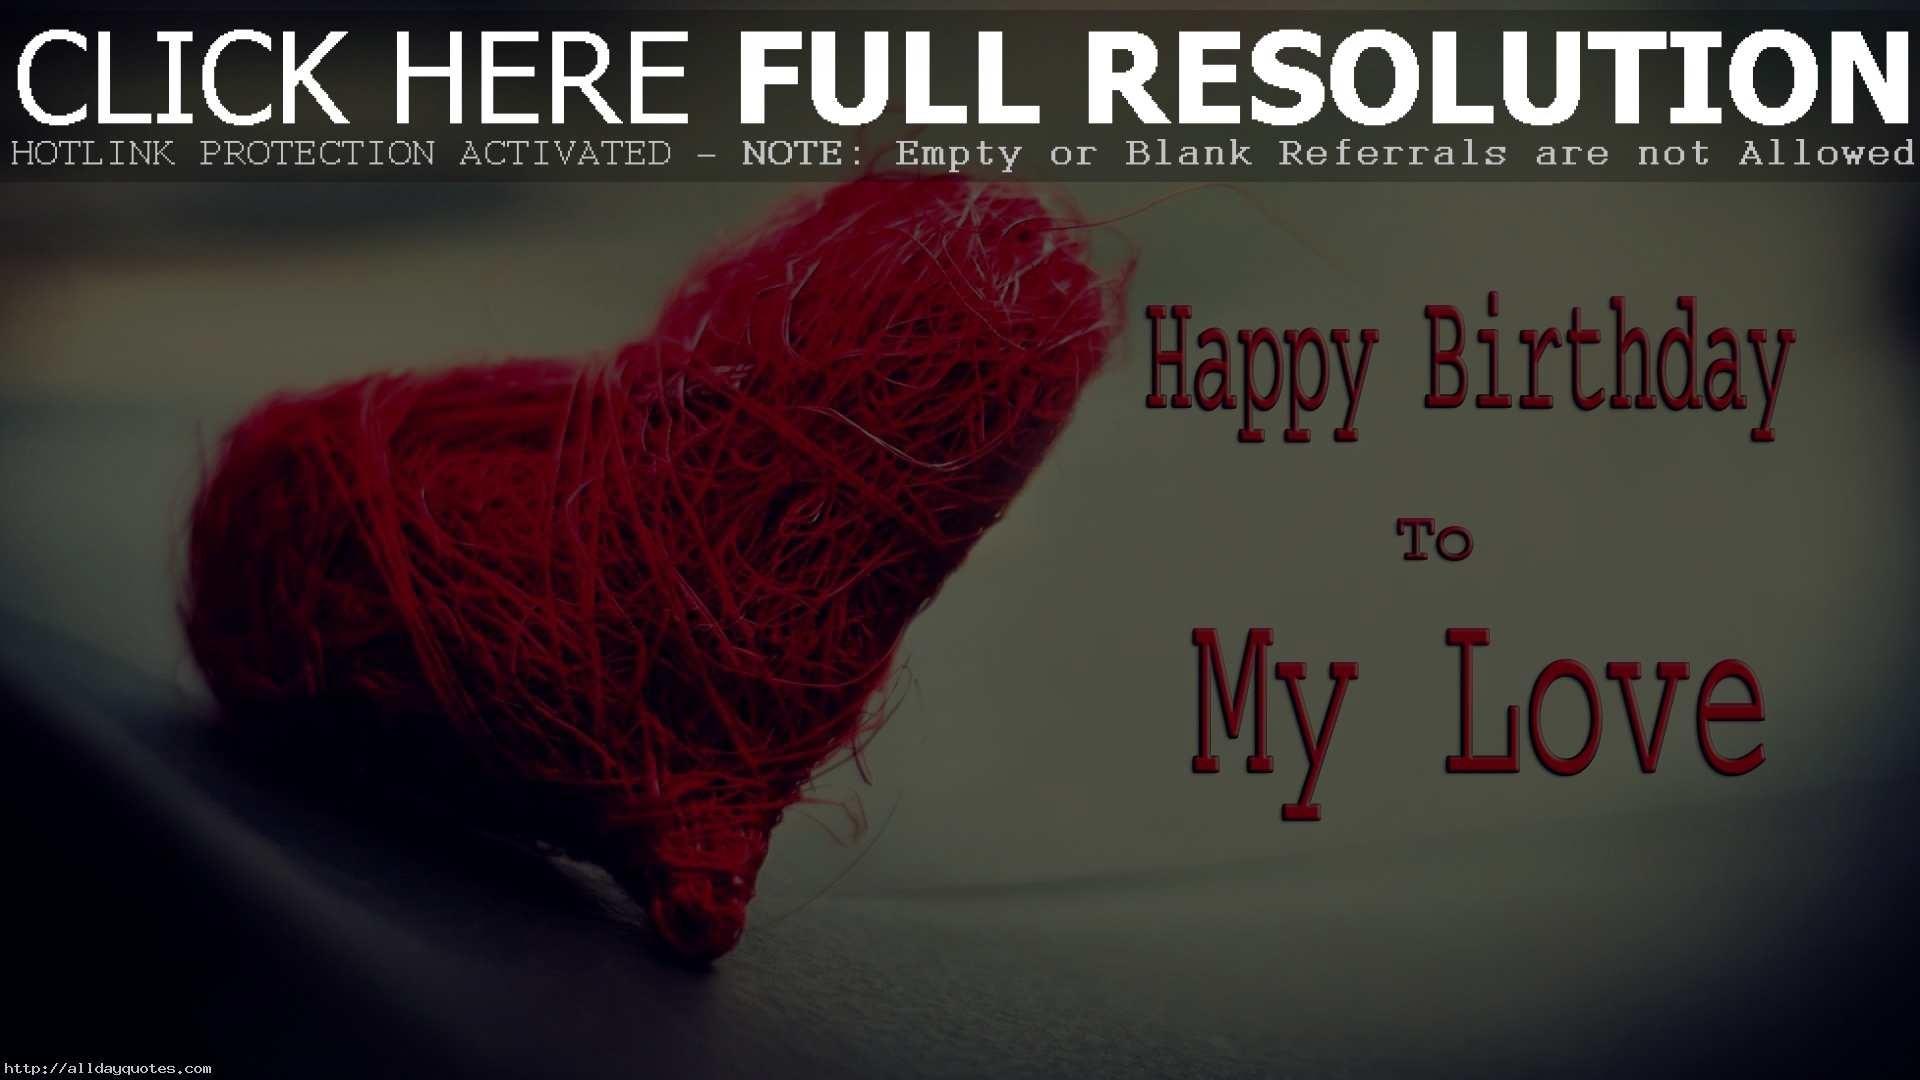 Happy Birthday Love Wallpaper 53 images